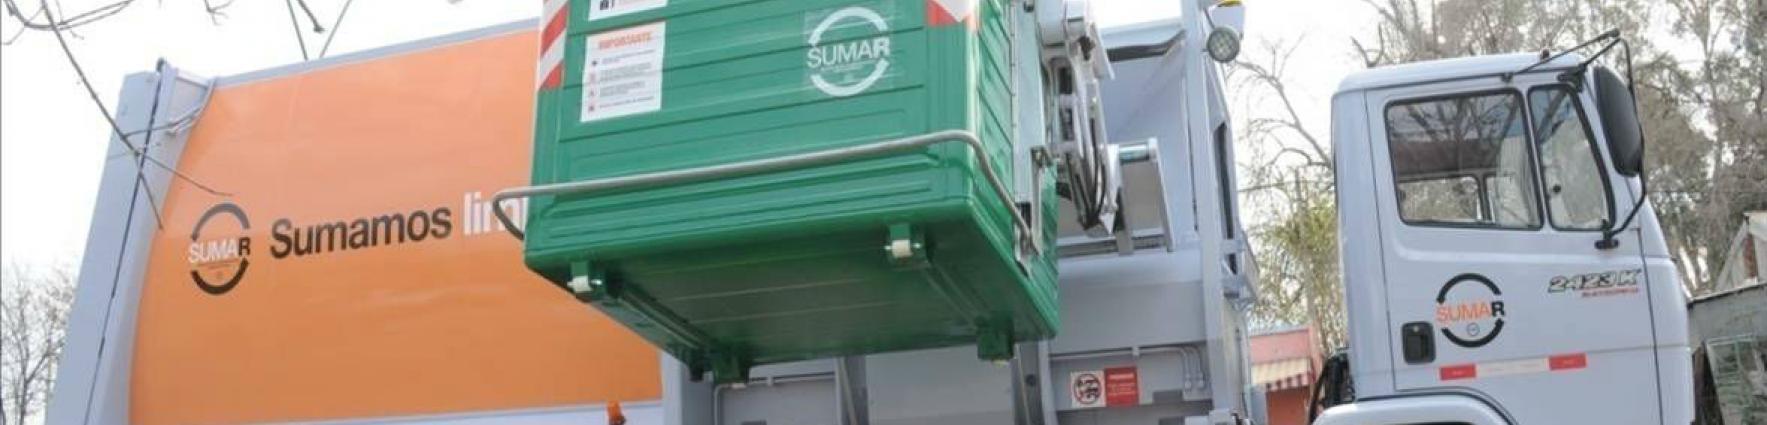 Camiones de recolección equipados con caja compactadora de residuos